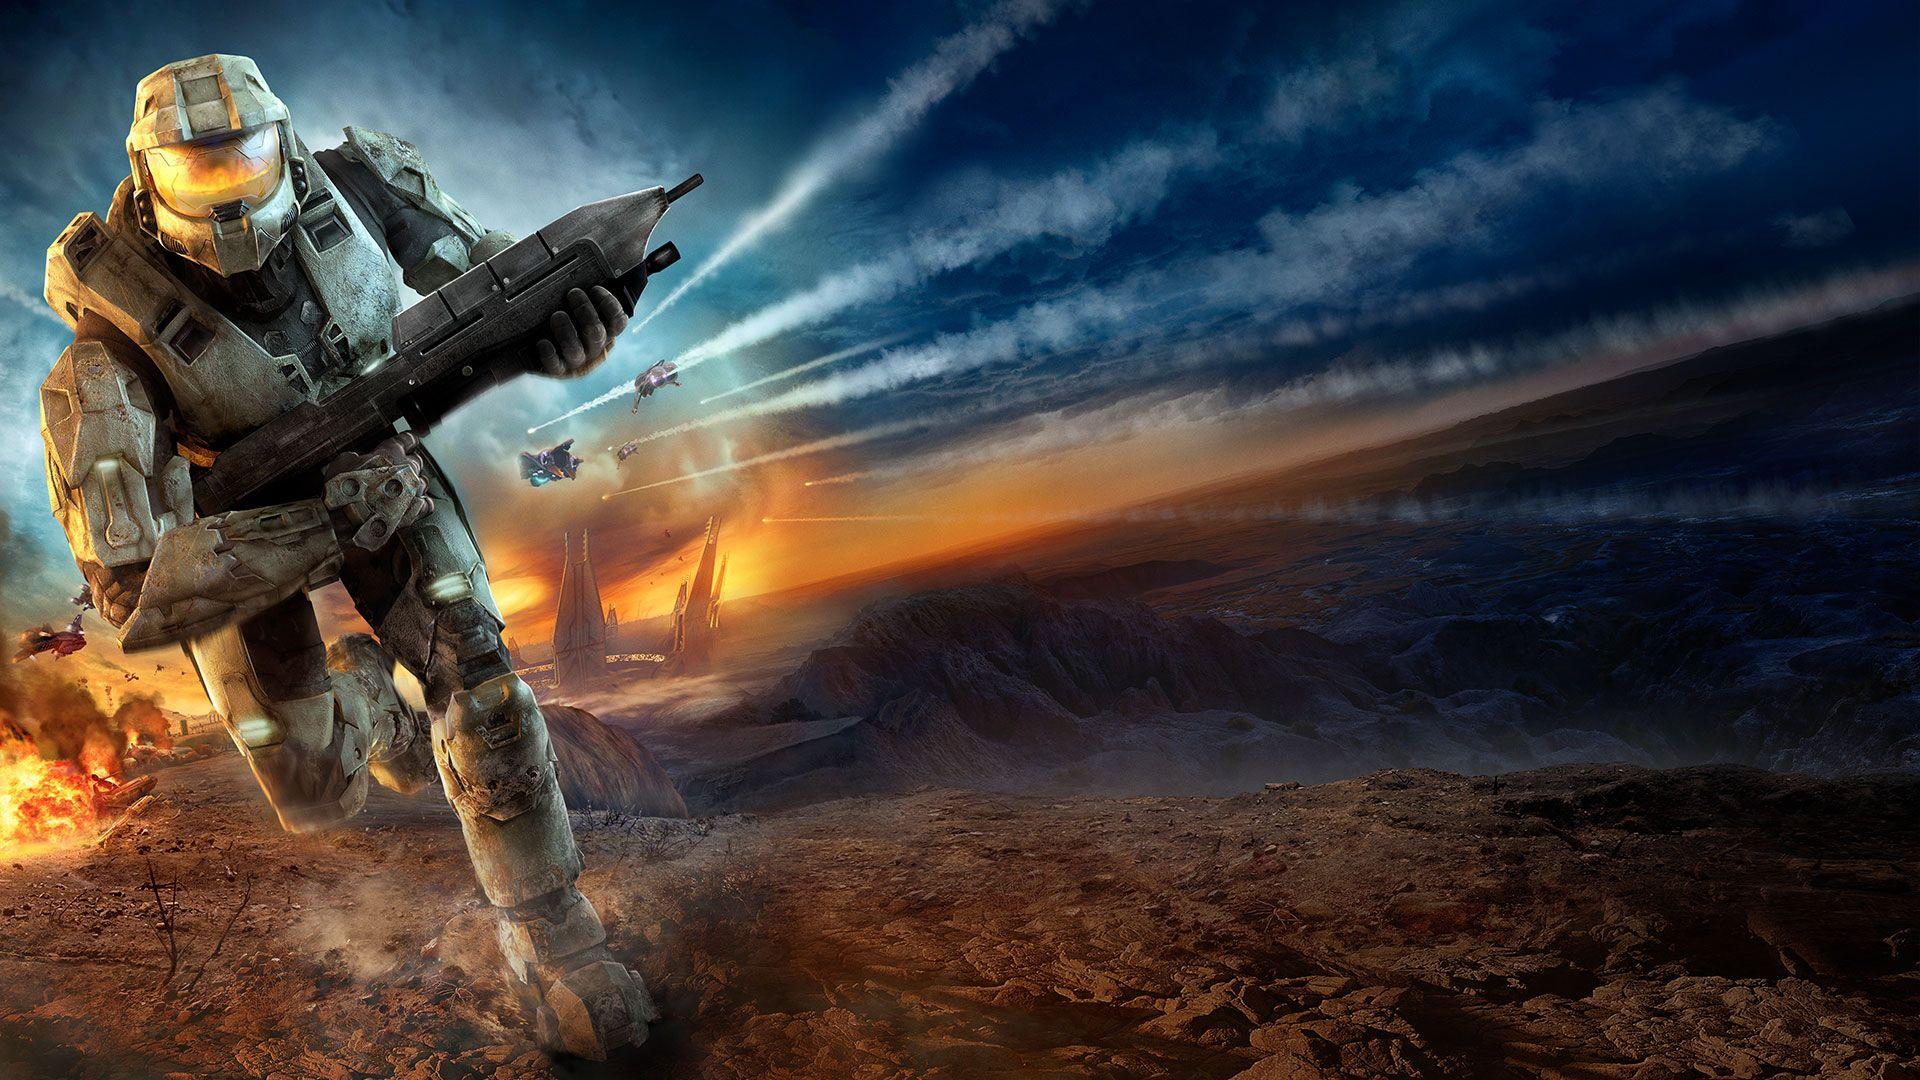 Halo 3 Google Search Halo 3 Halo Halo Poster